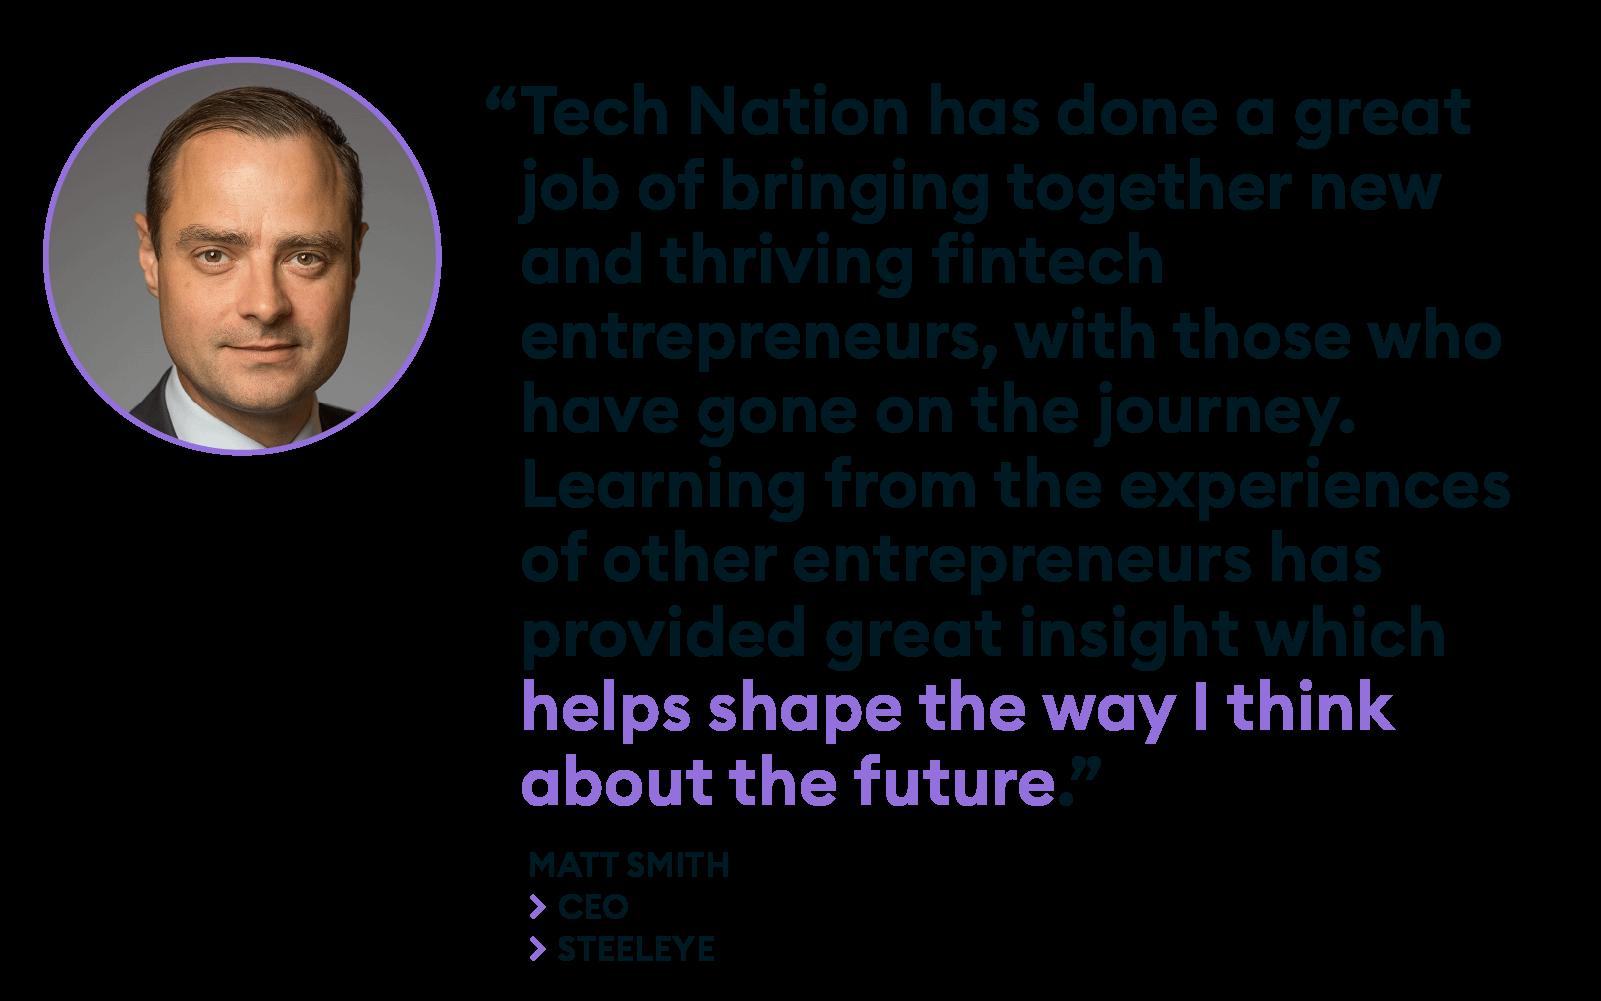 Matt Smith of SteelEye gives feedback on Tech Nation's Fintech programme